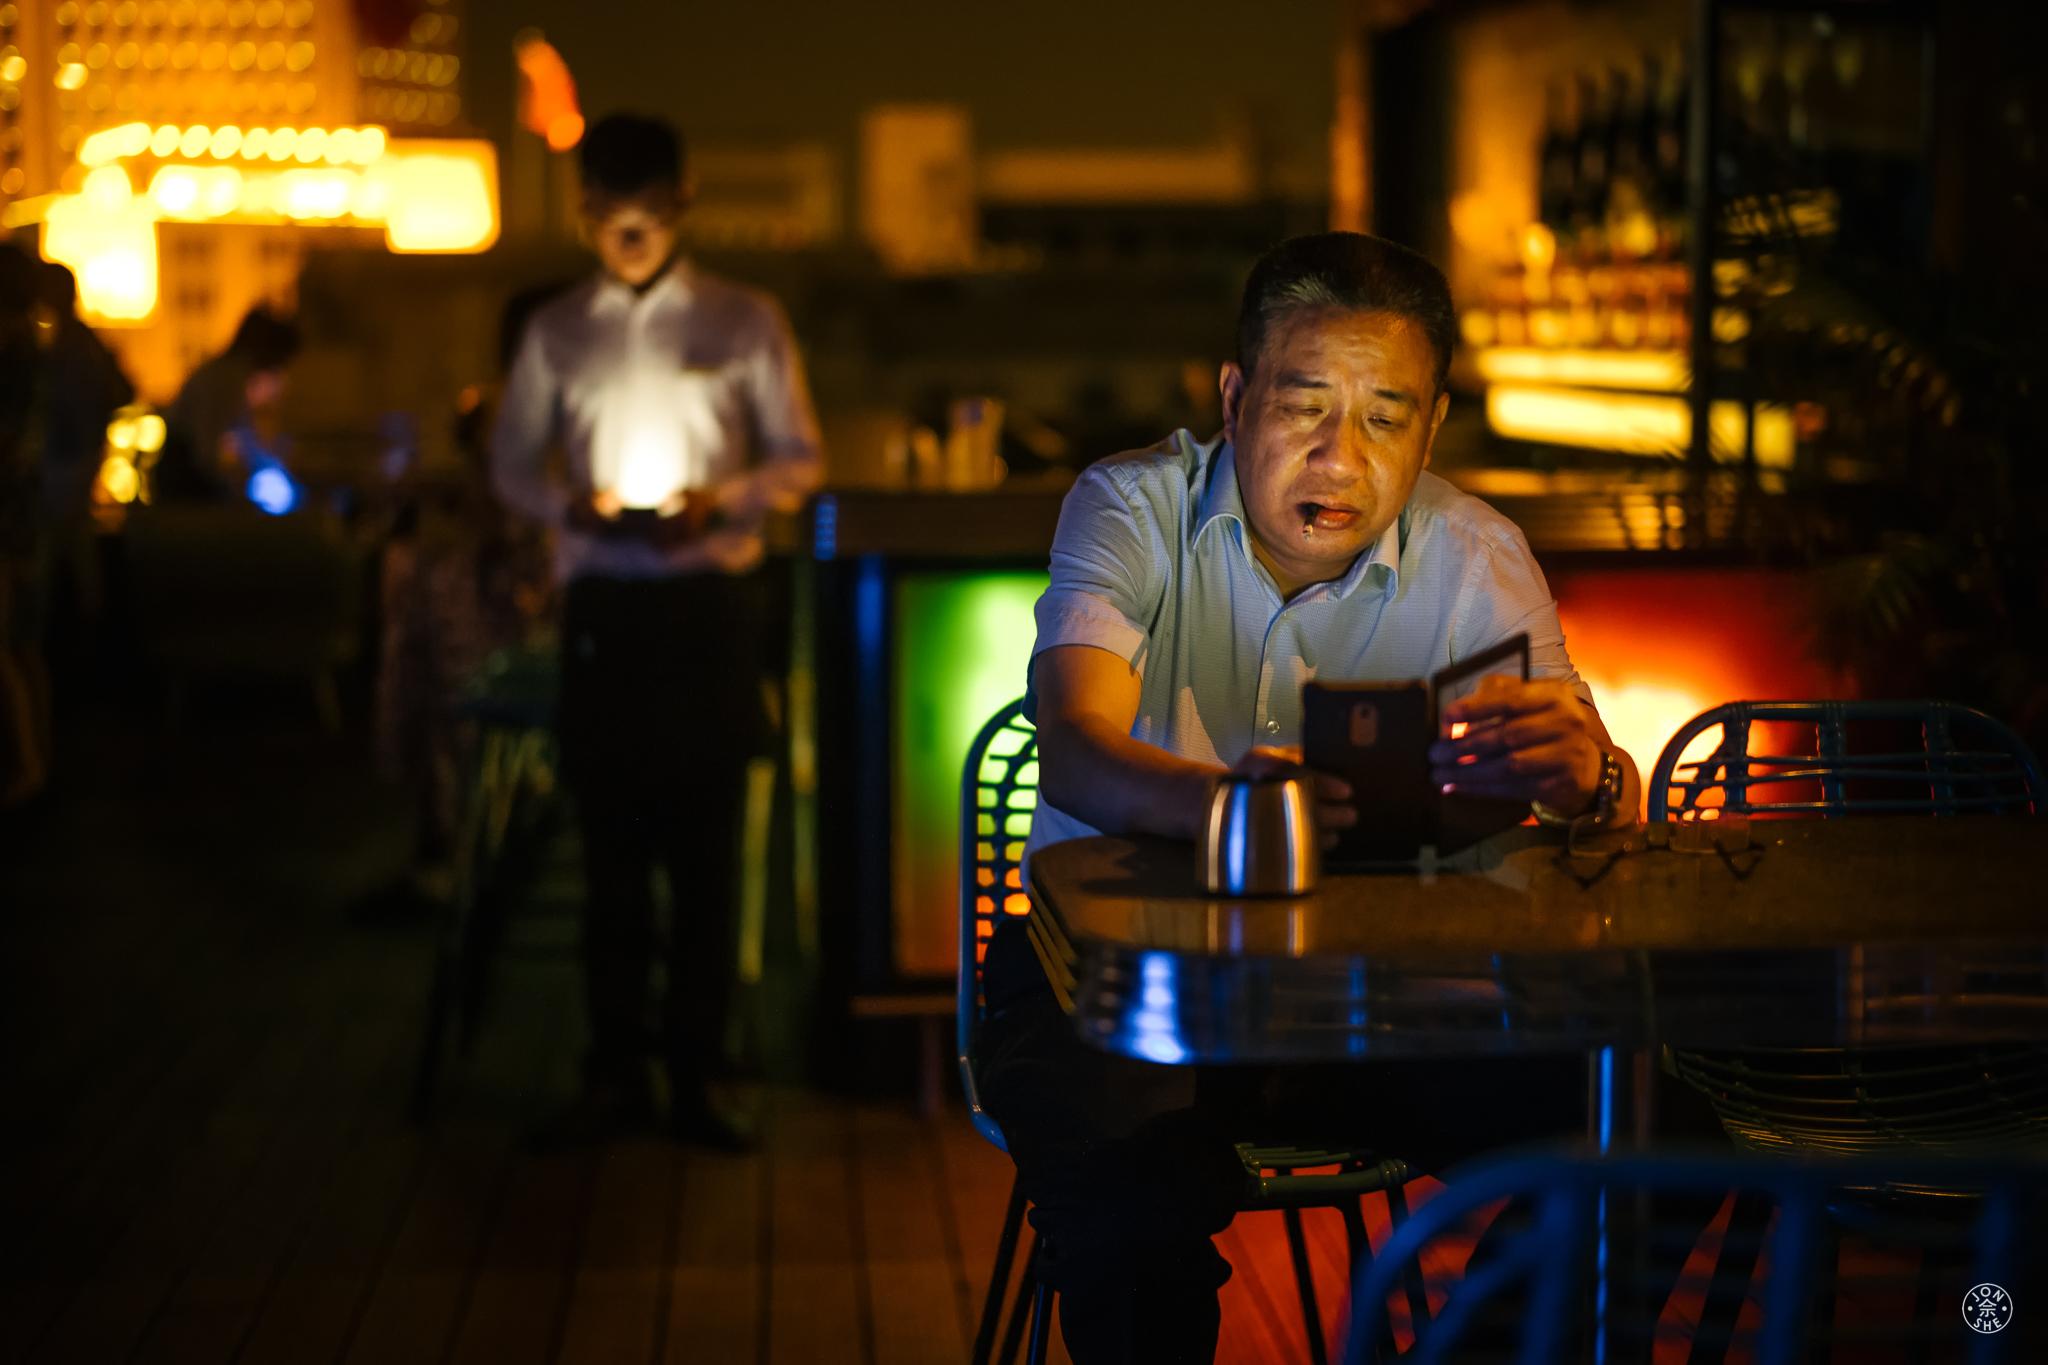 Cigarette Man, WeChat Boy